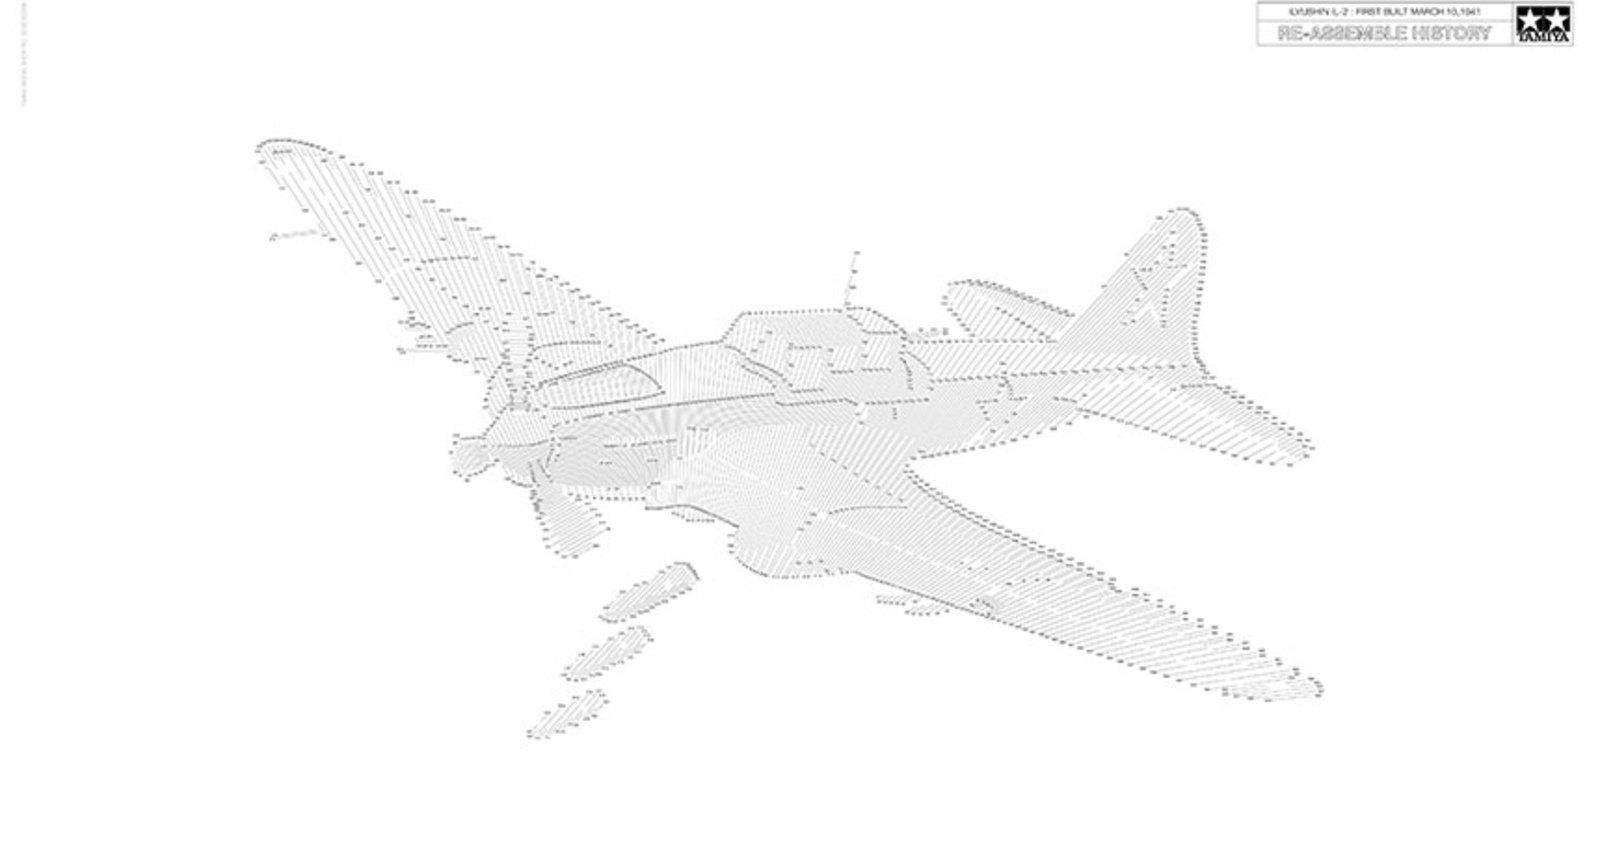 BATTLESHIP/AIRCRAFT/TANK